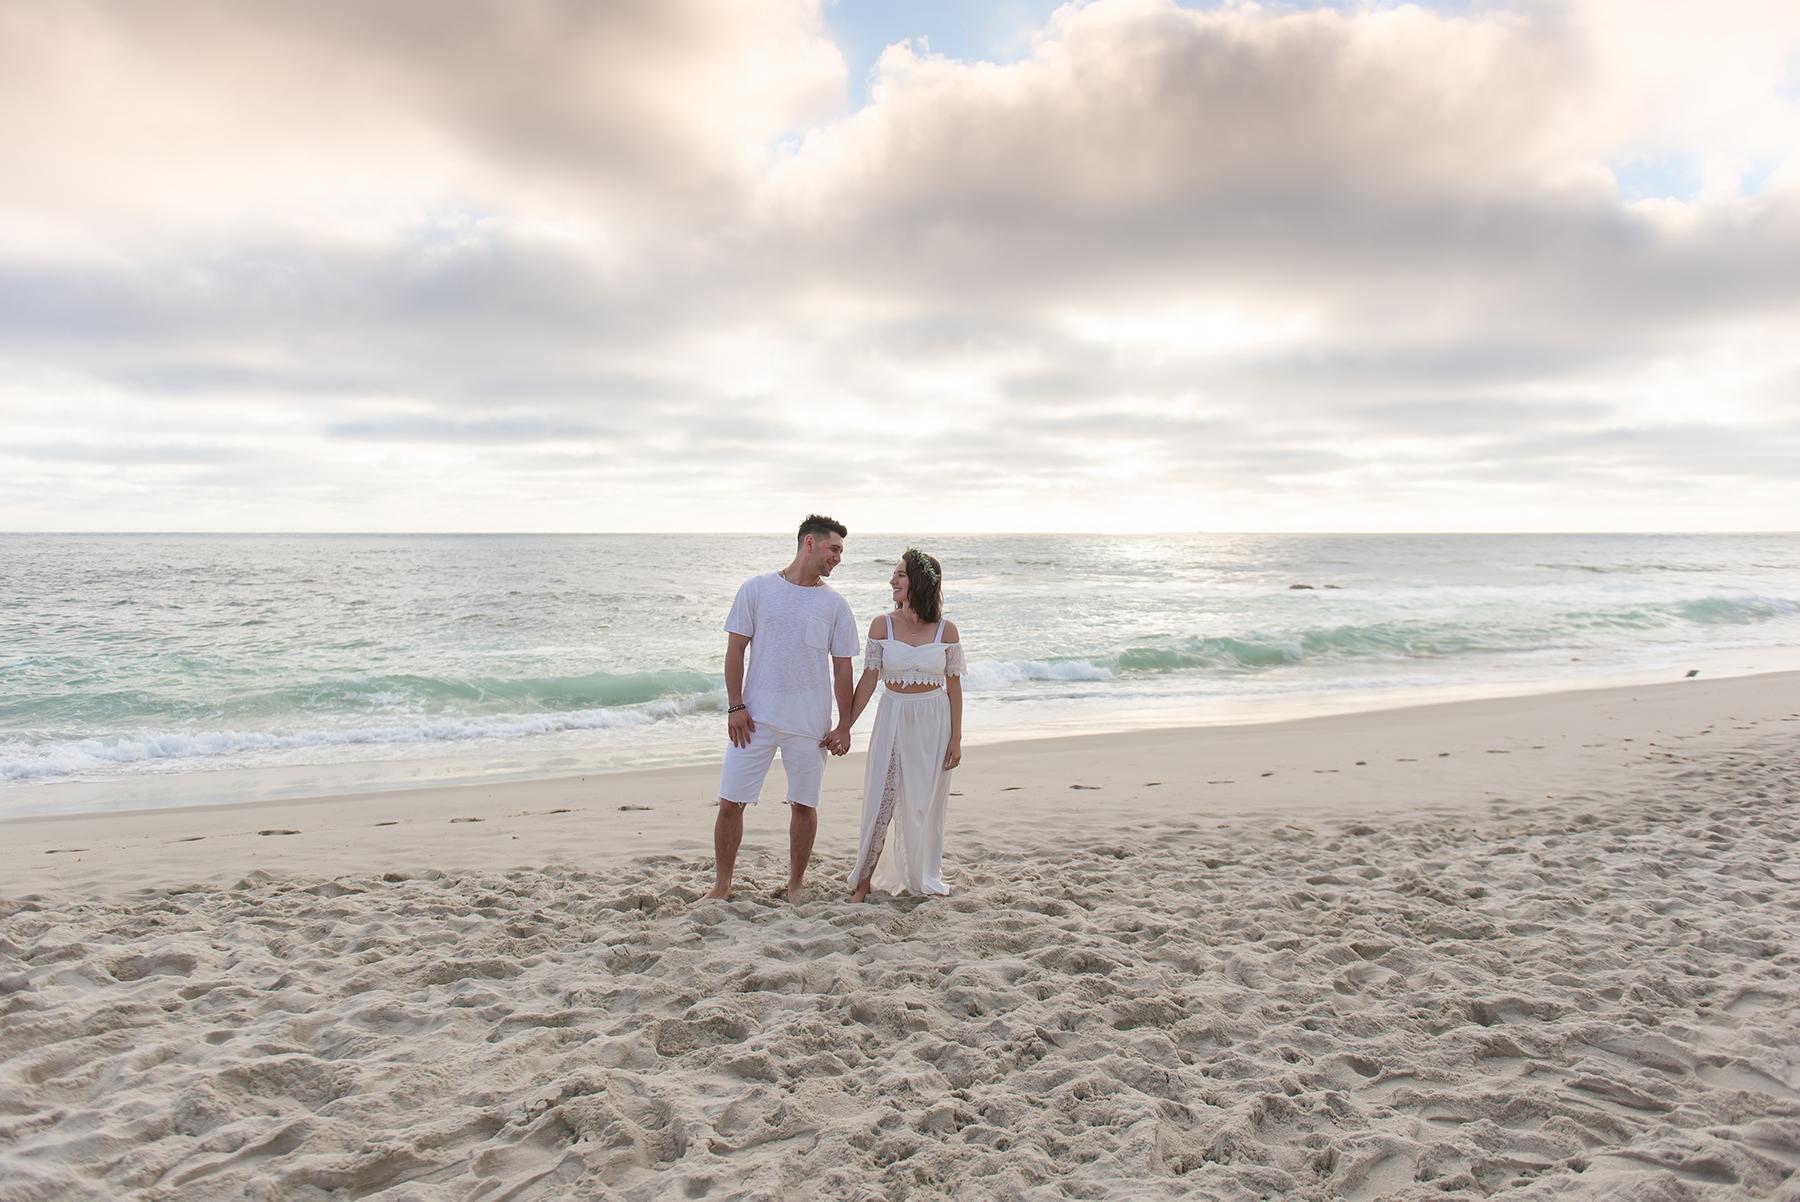 Romantic Beach Sunset Engagement Session Victoria Parker Photography01